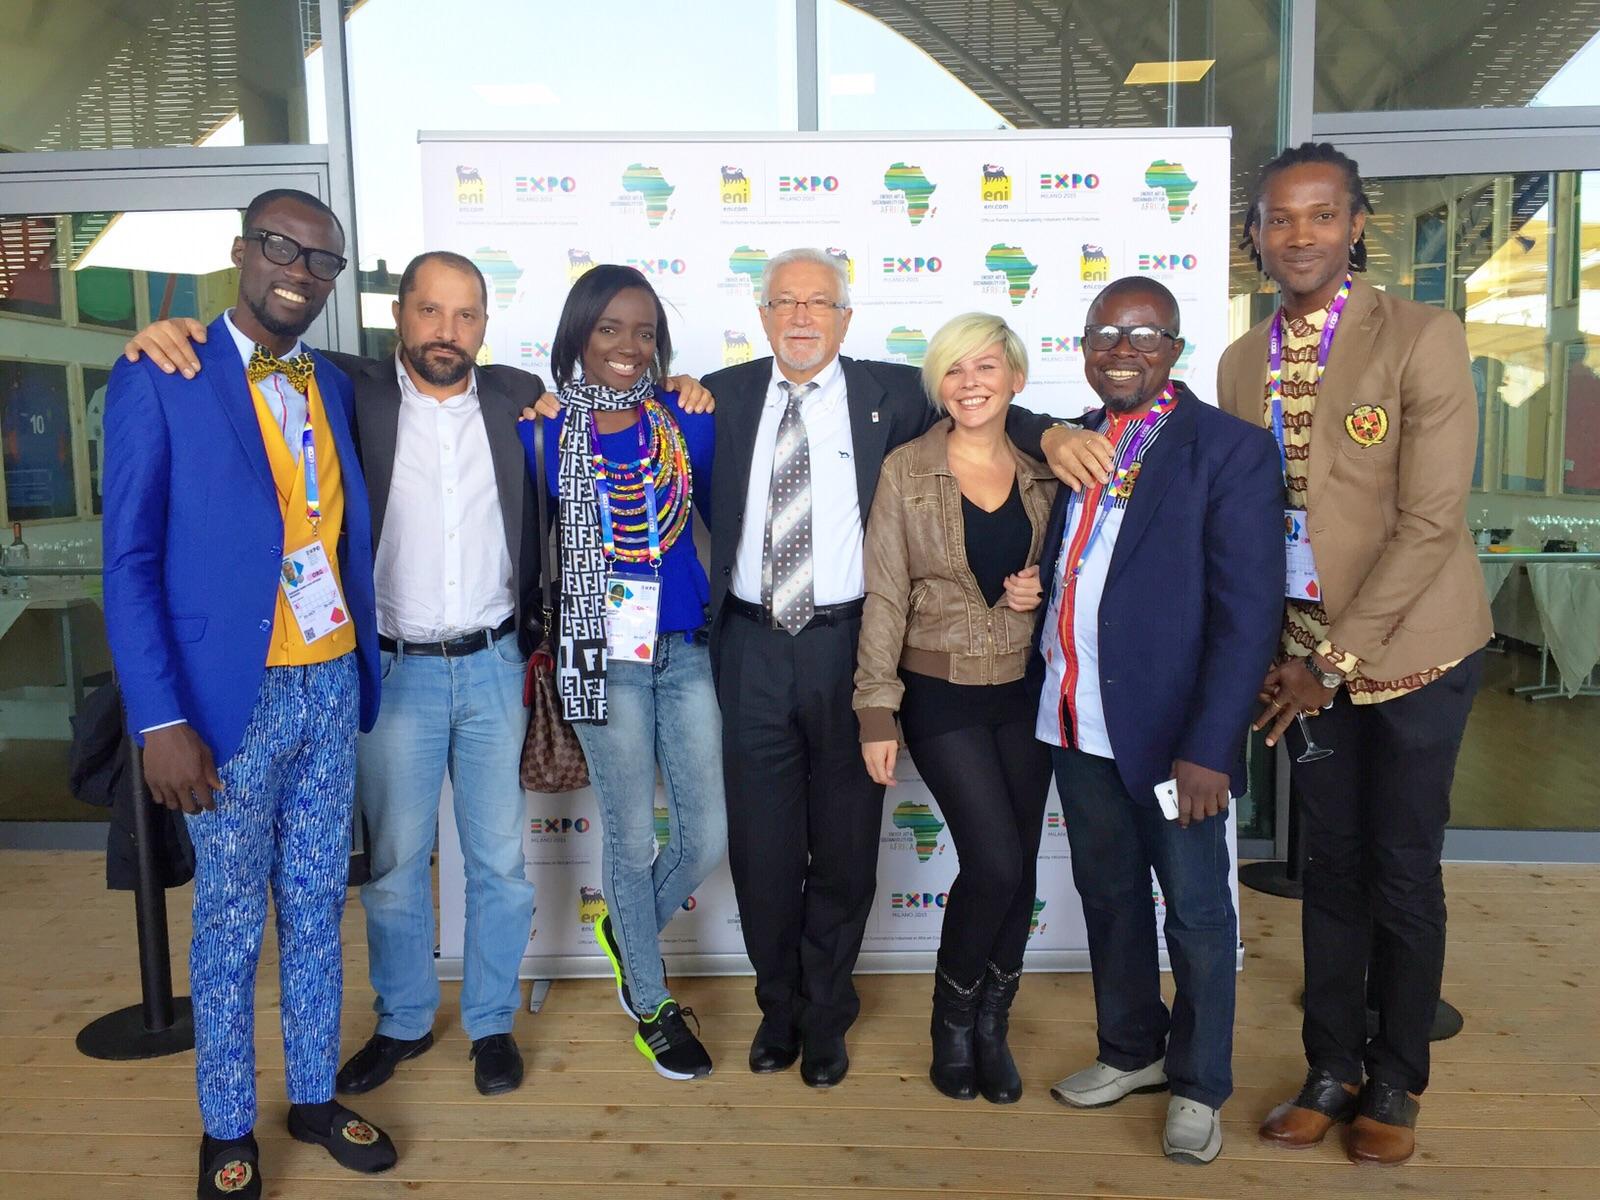 Photos of Ghanaian Fashion Designer Abrantie The Gentleman & Model Stephen Kojo Bonsu At The Milan Expo 2015